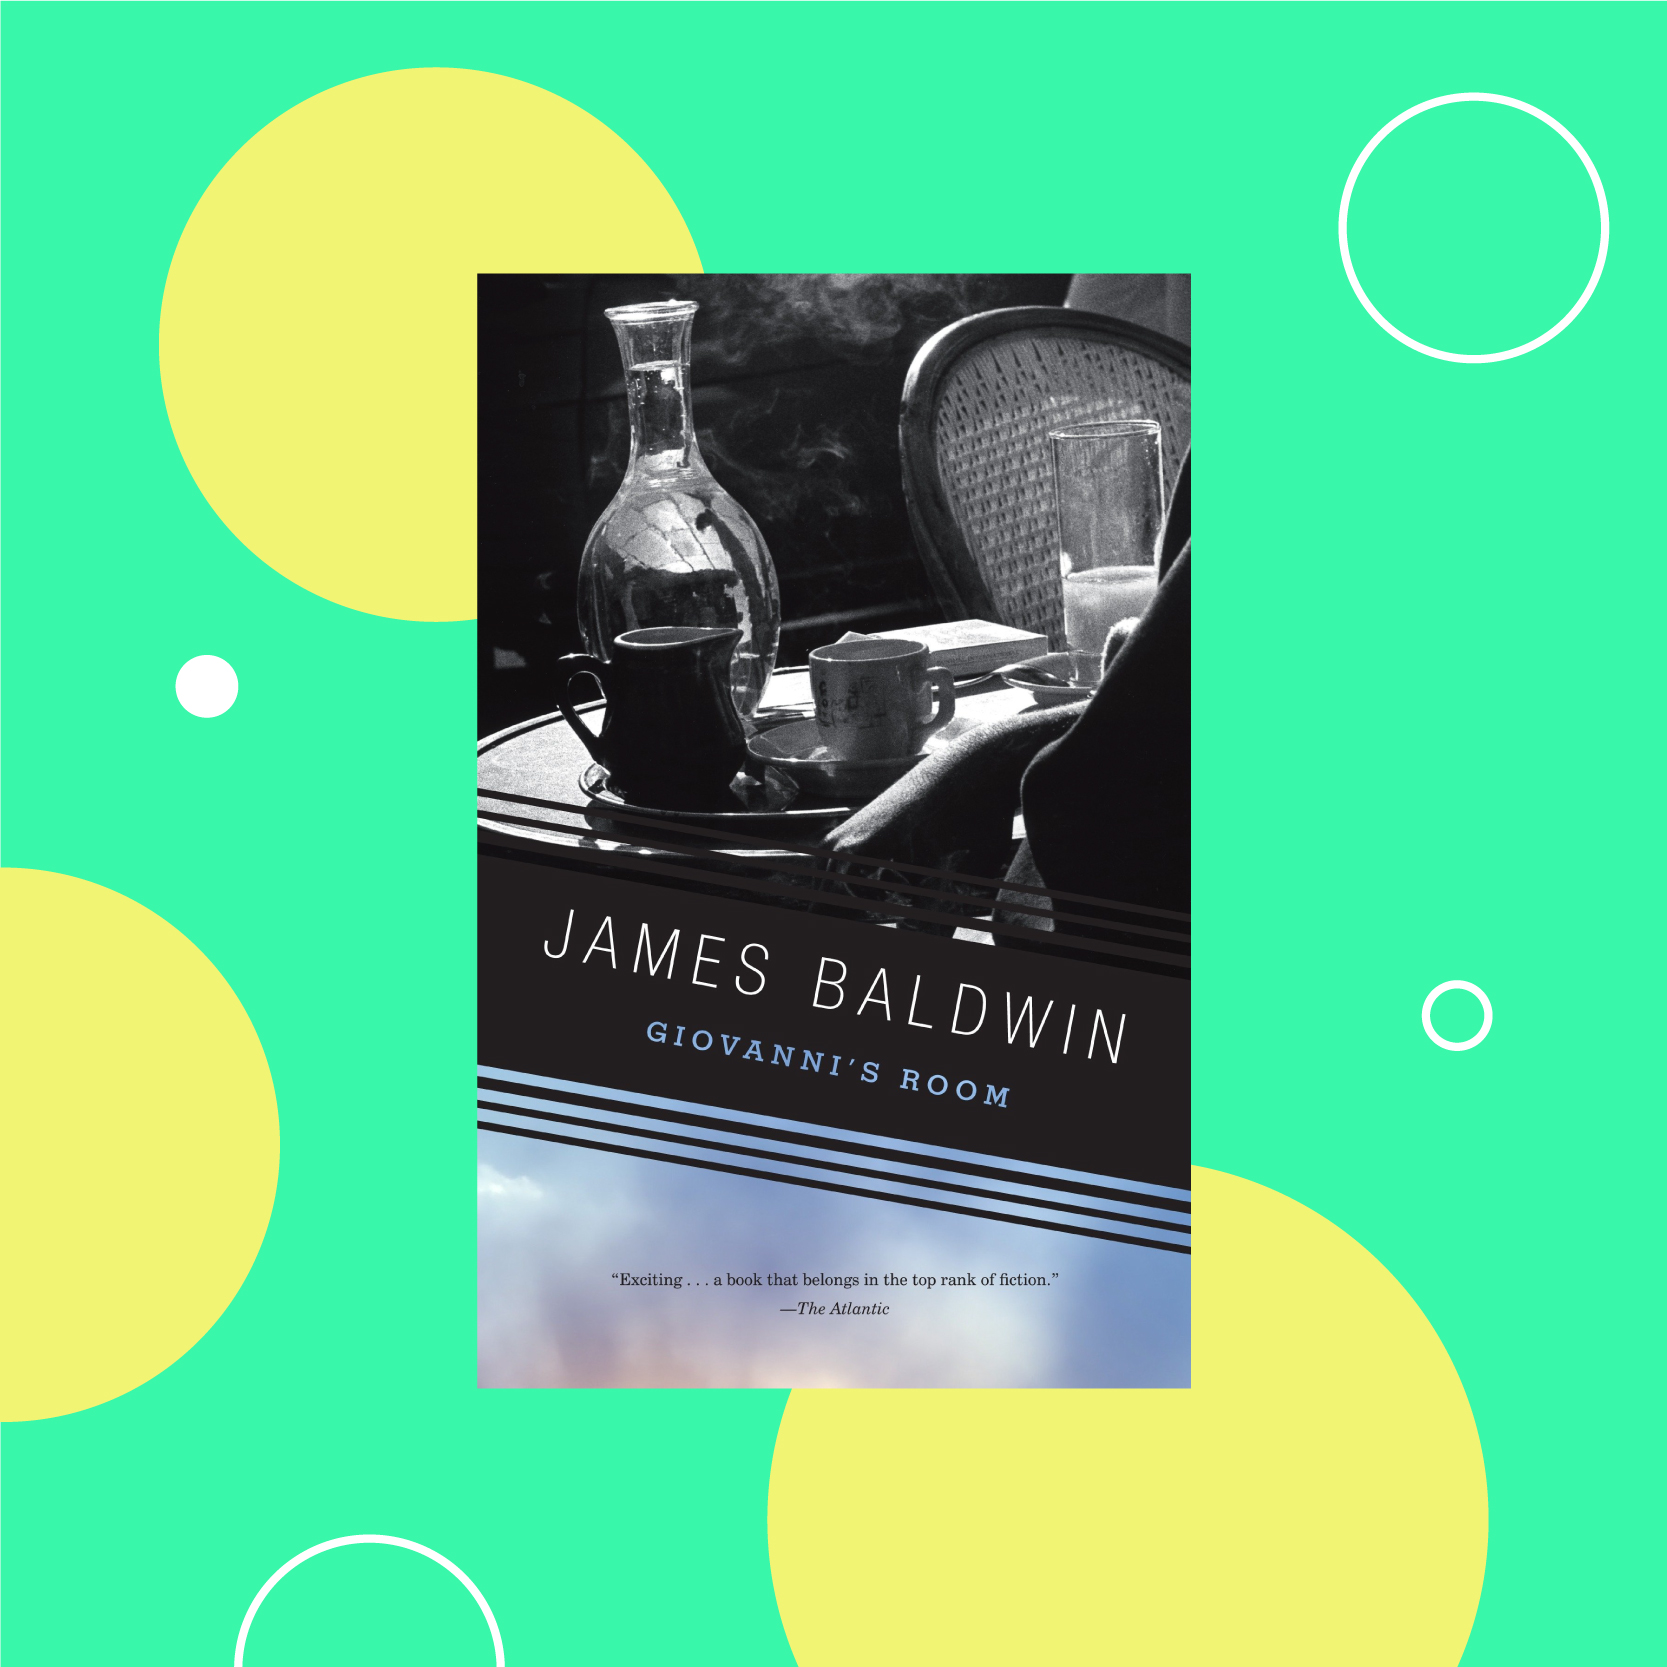 Giovannis-Room-Baldwin.jpg